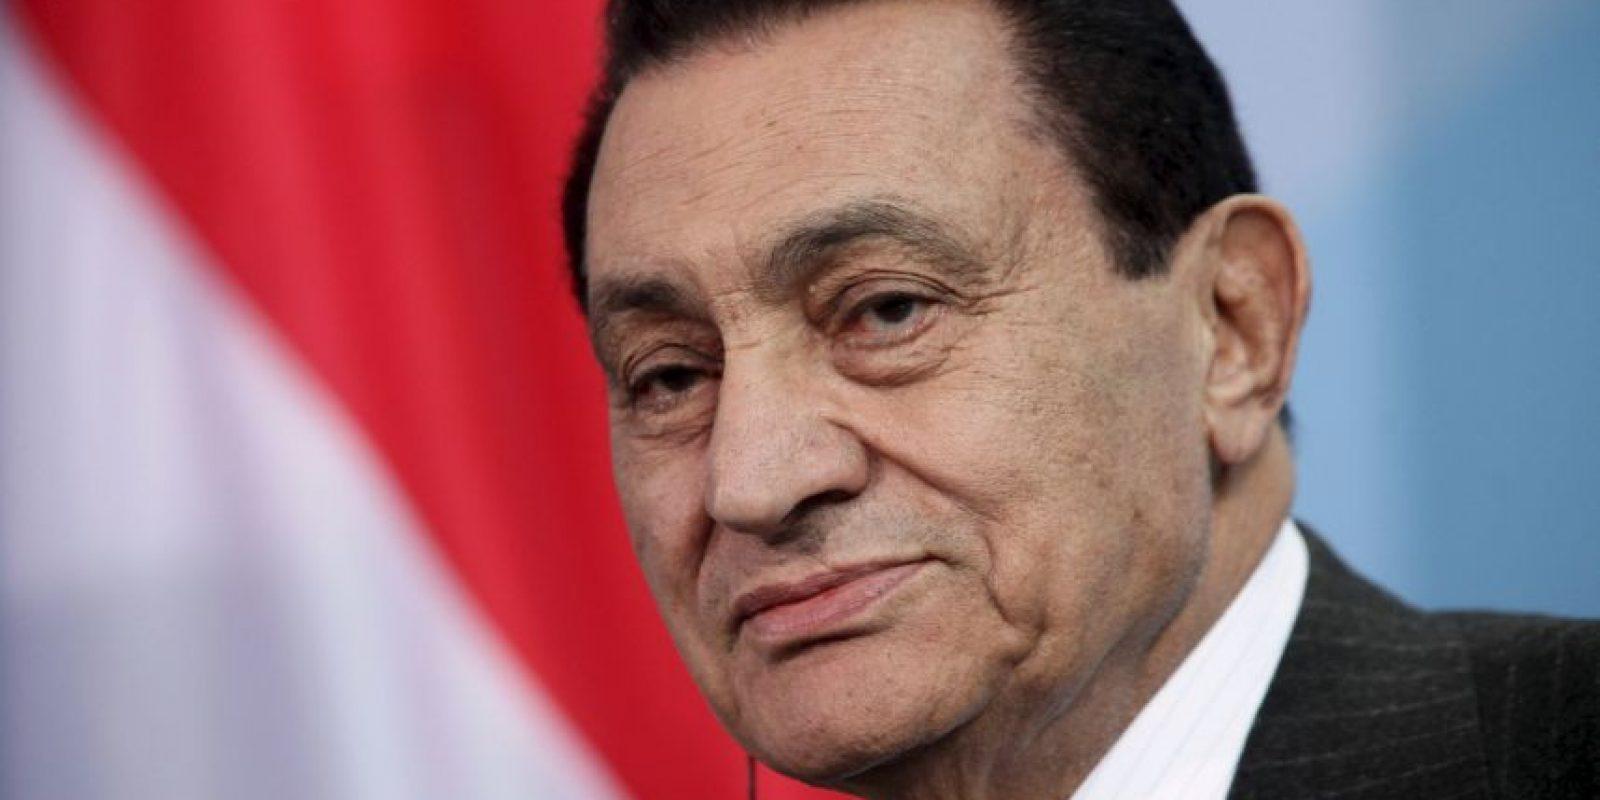 El Tribunal Superior de Justicia ha ordenado que el expresidente Hosni Mubarak vuelva a ser juzgado. Foto:Getty Images